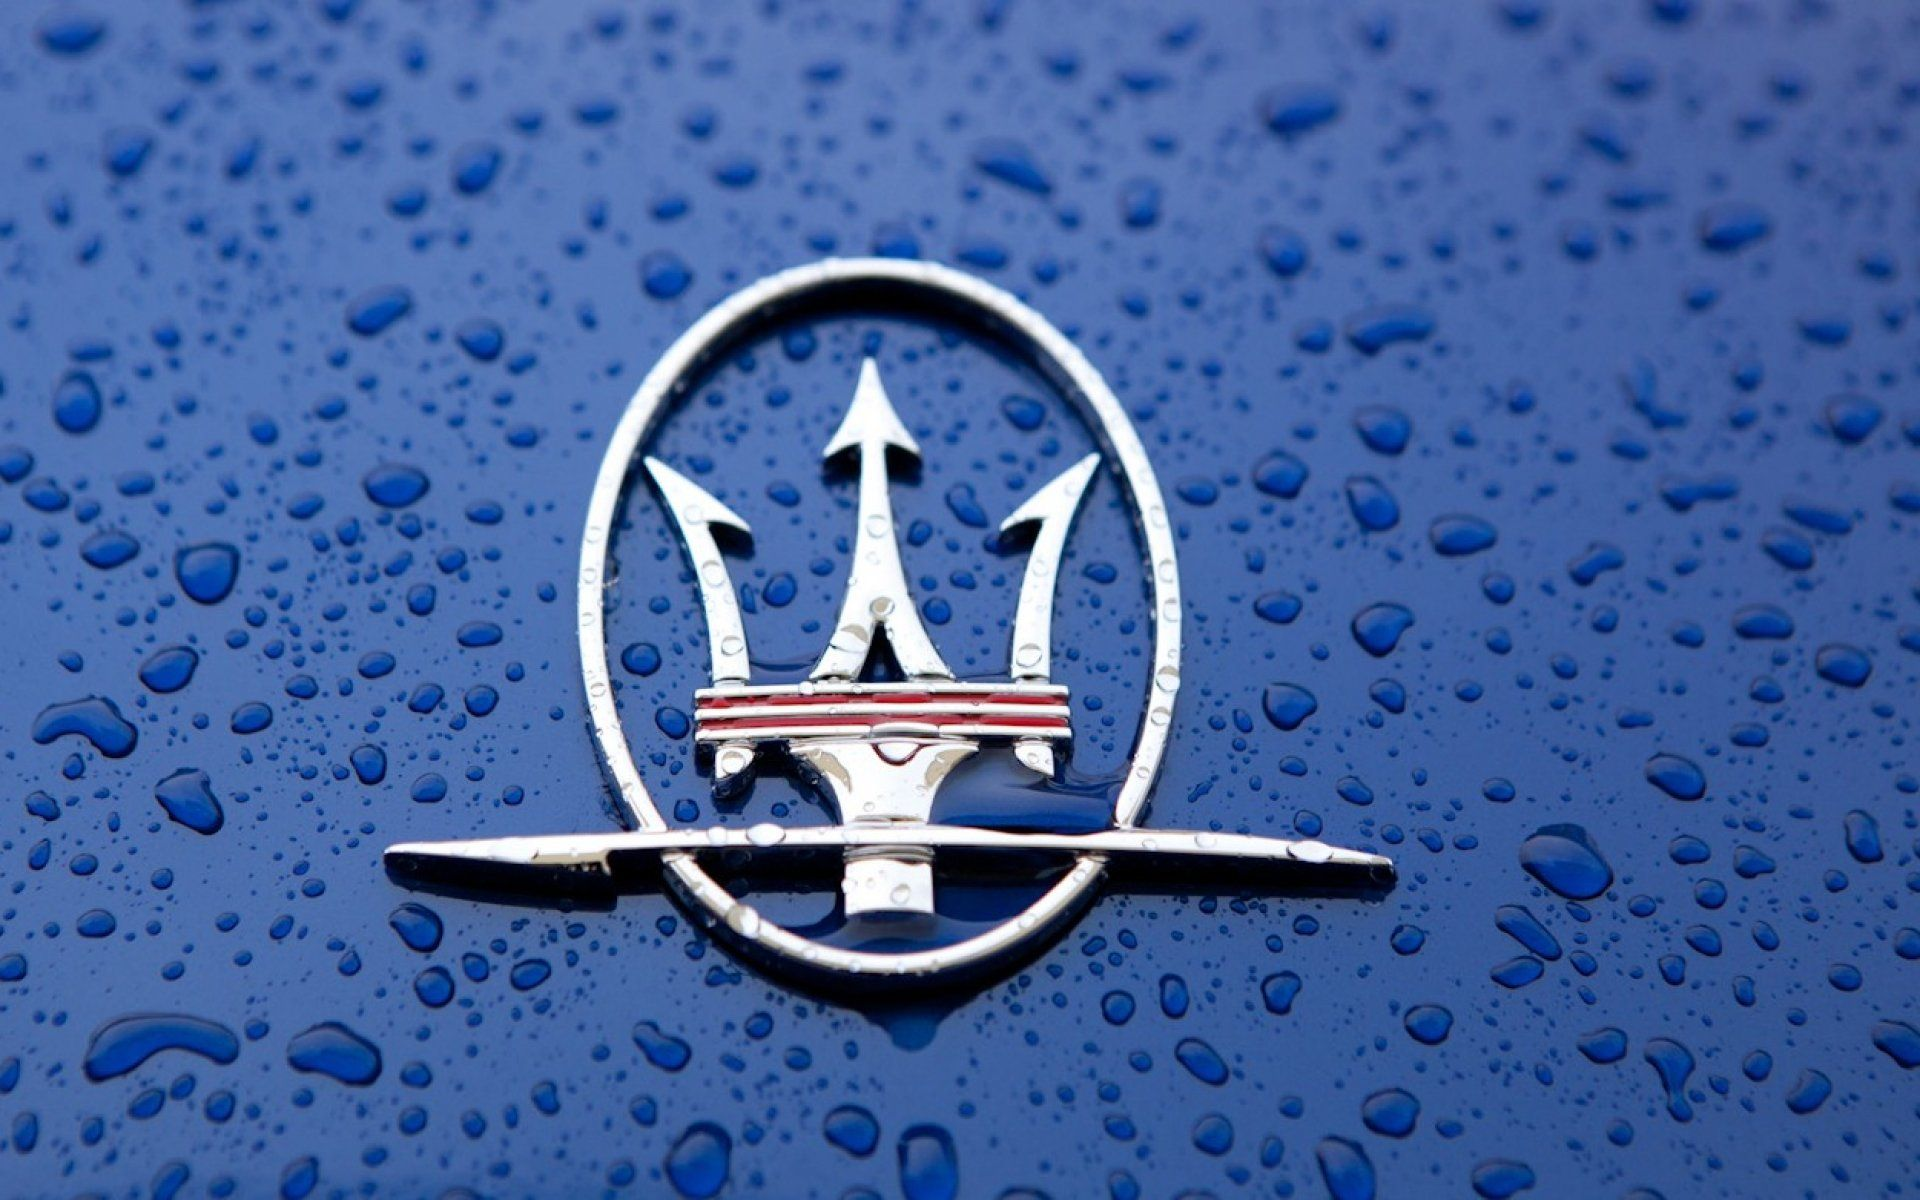 Maserati Wallpaper HD Logo Wallpaper 壁紙, Iphone 用壁紙, 標記